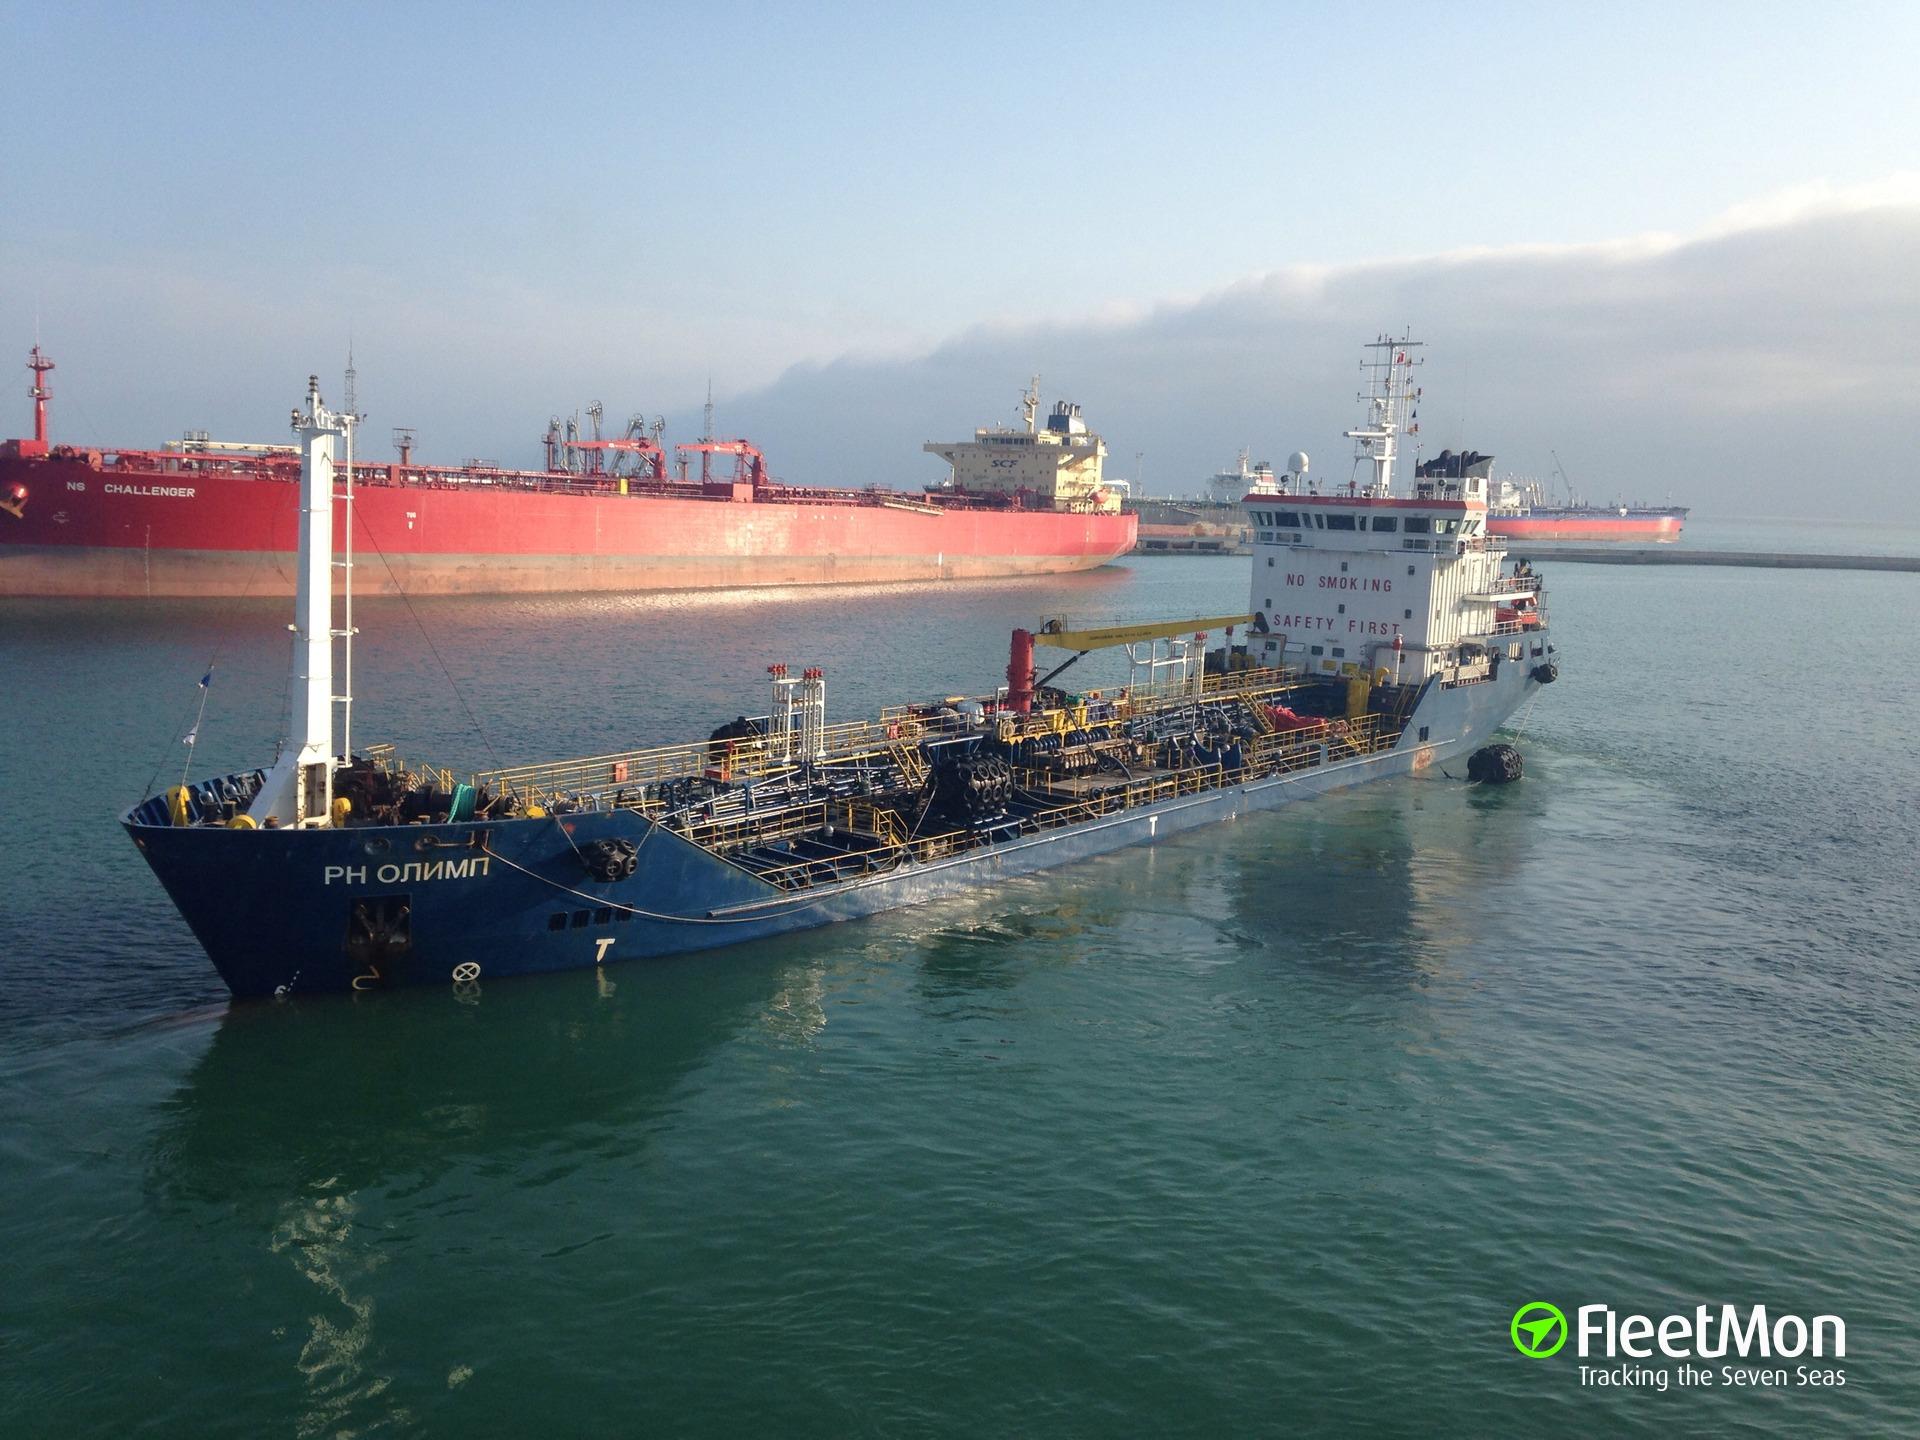 Turkish tanker Firdes under tow after engine failure, Bay of Biscay